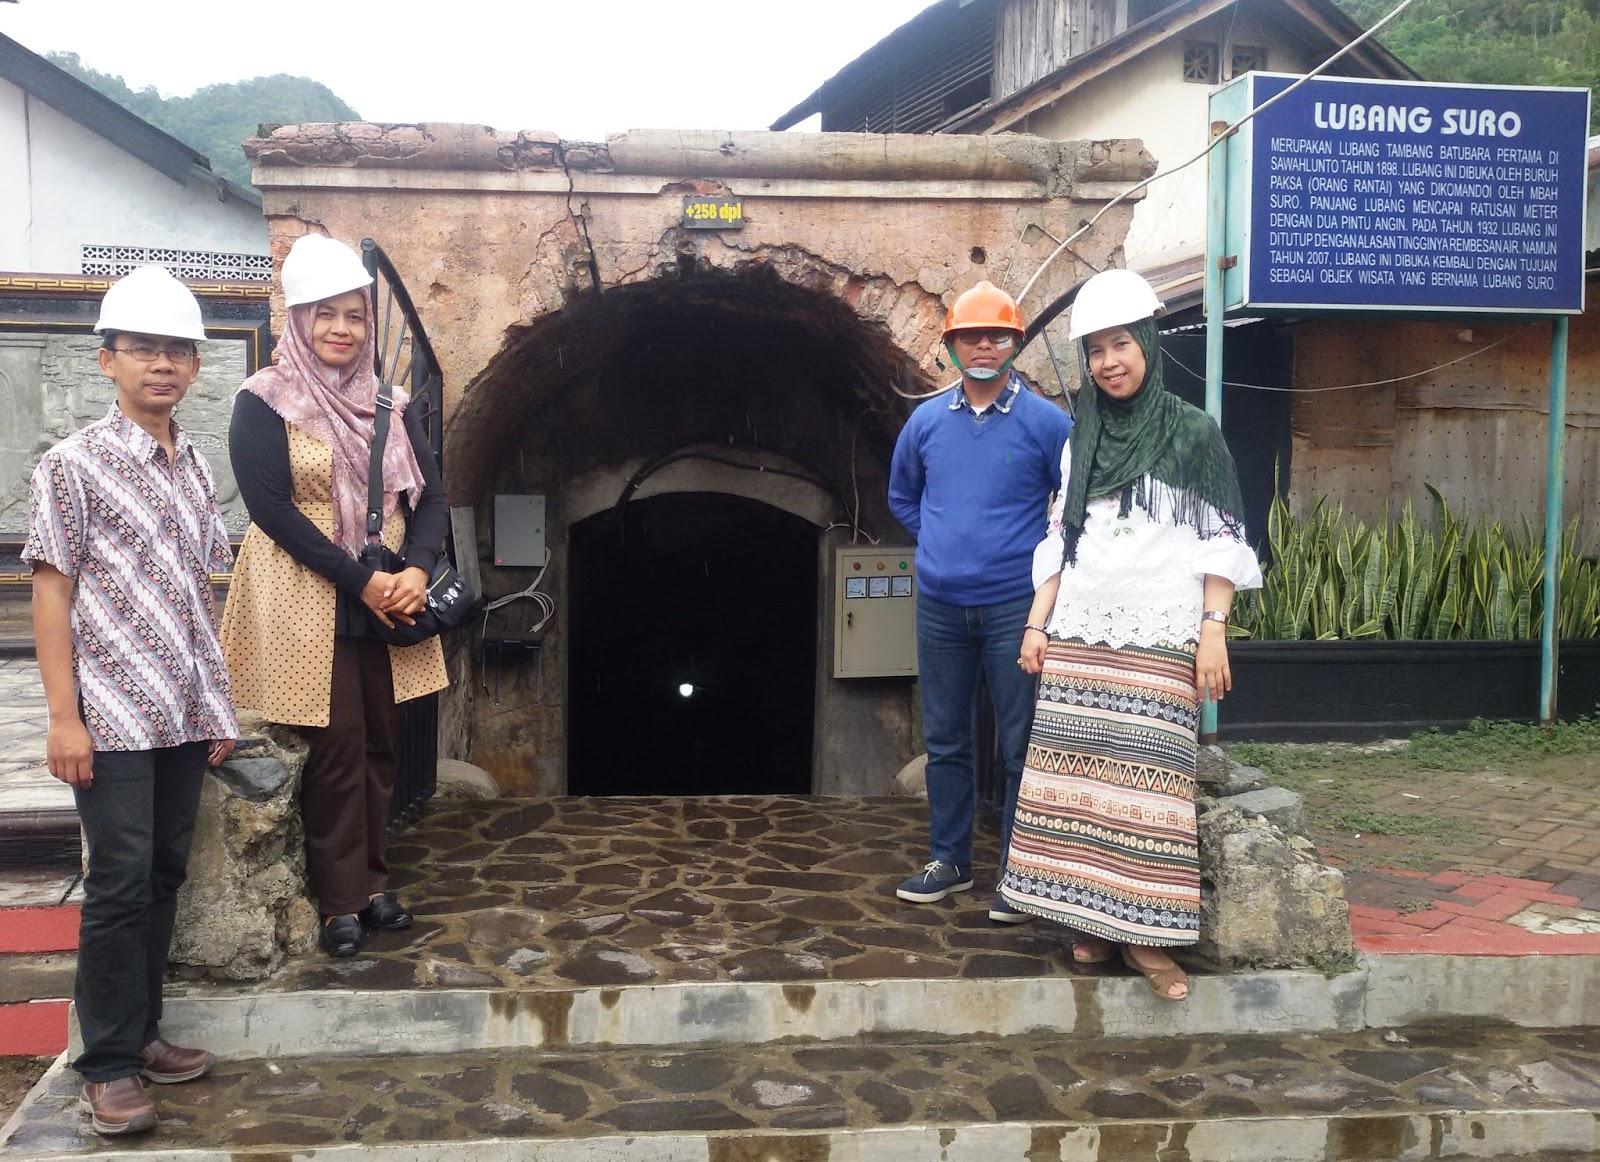 Yervi Hesna 2018 Produk Ukm Bumn Bahan Songket Sulam Katun Merah Jejak Imigran Belanda Dan Jawa